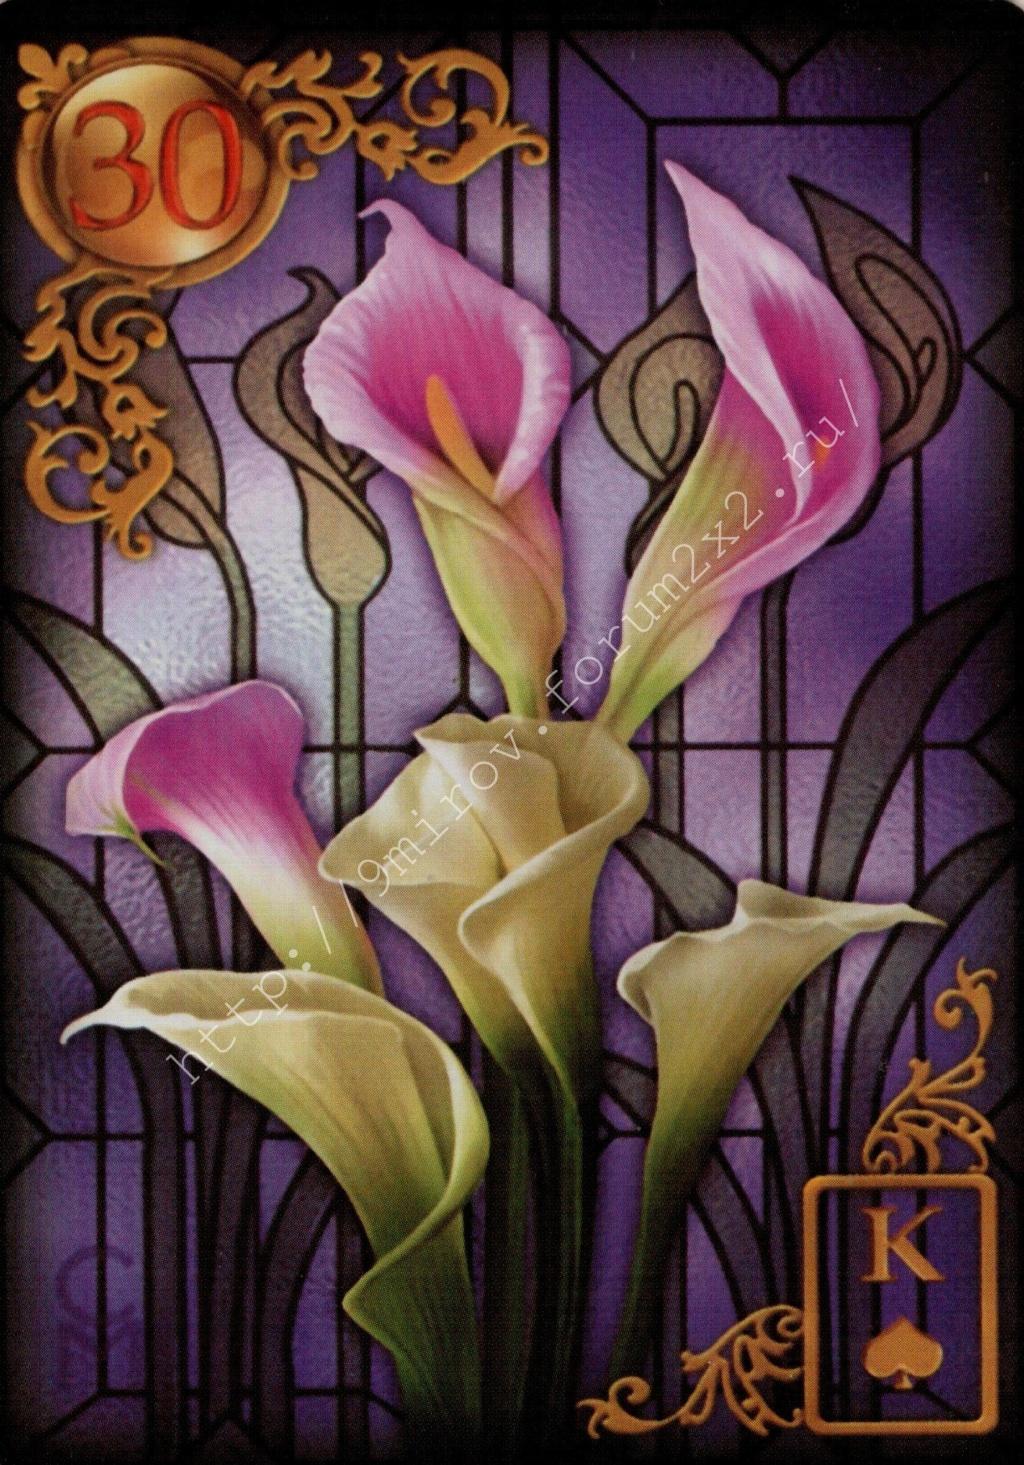 Золотые мечты Ленорман (Расширенное издание) | Gilded Reverie Lenormand. Галерея.  Water124